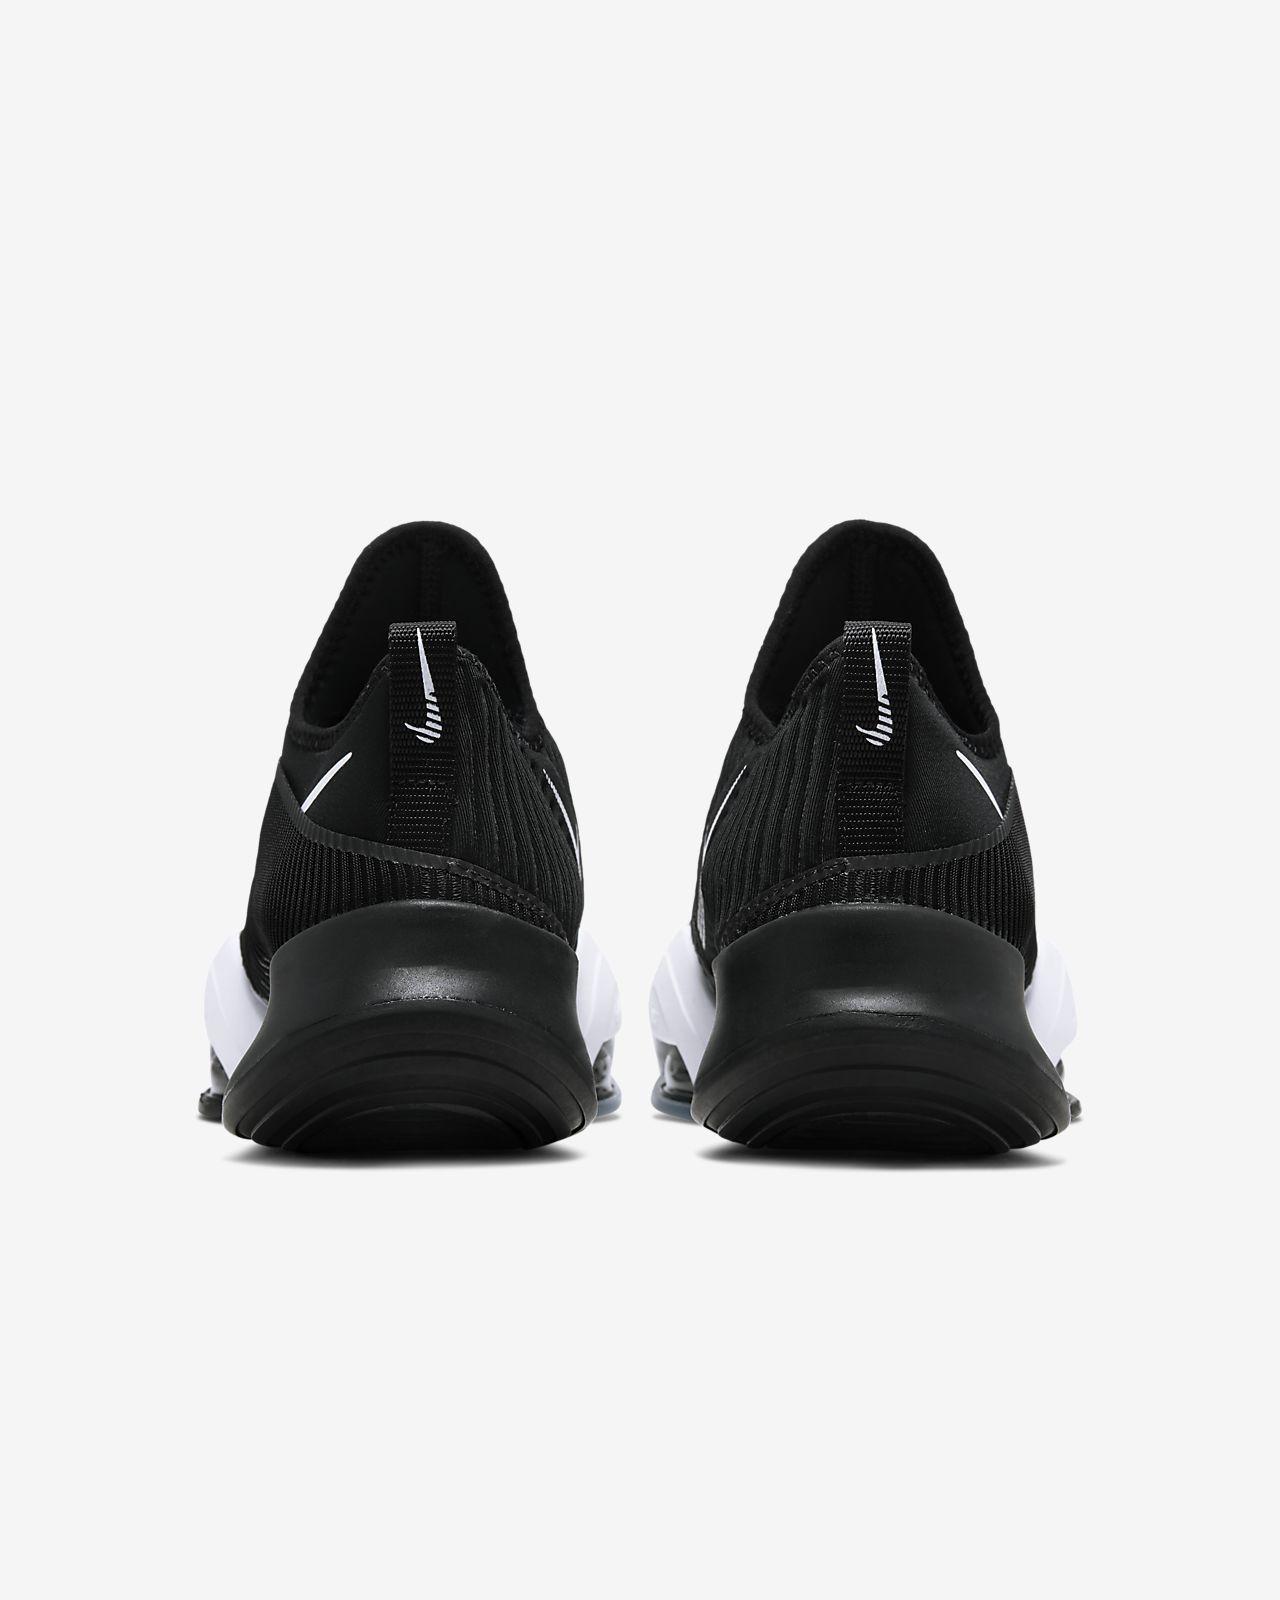 Sapatilhas de aulas de HIIT Nike Air Zoom SuperRep para mulher